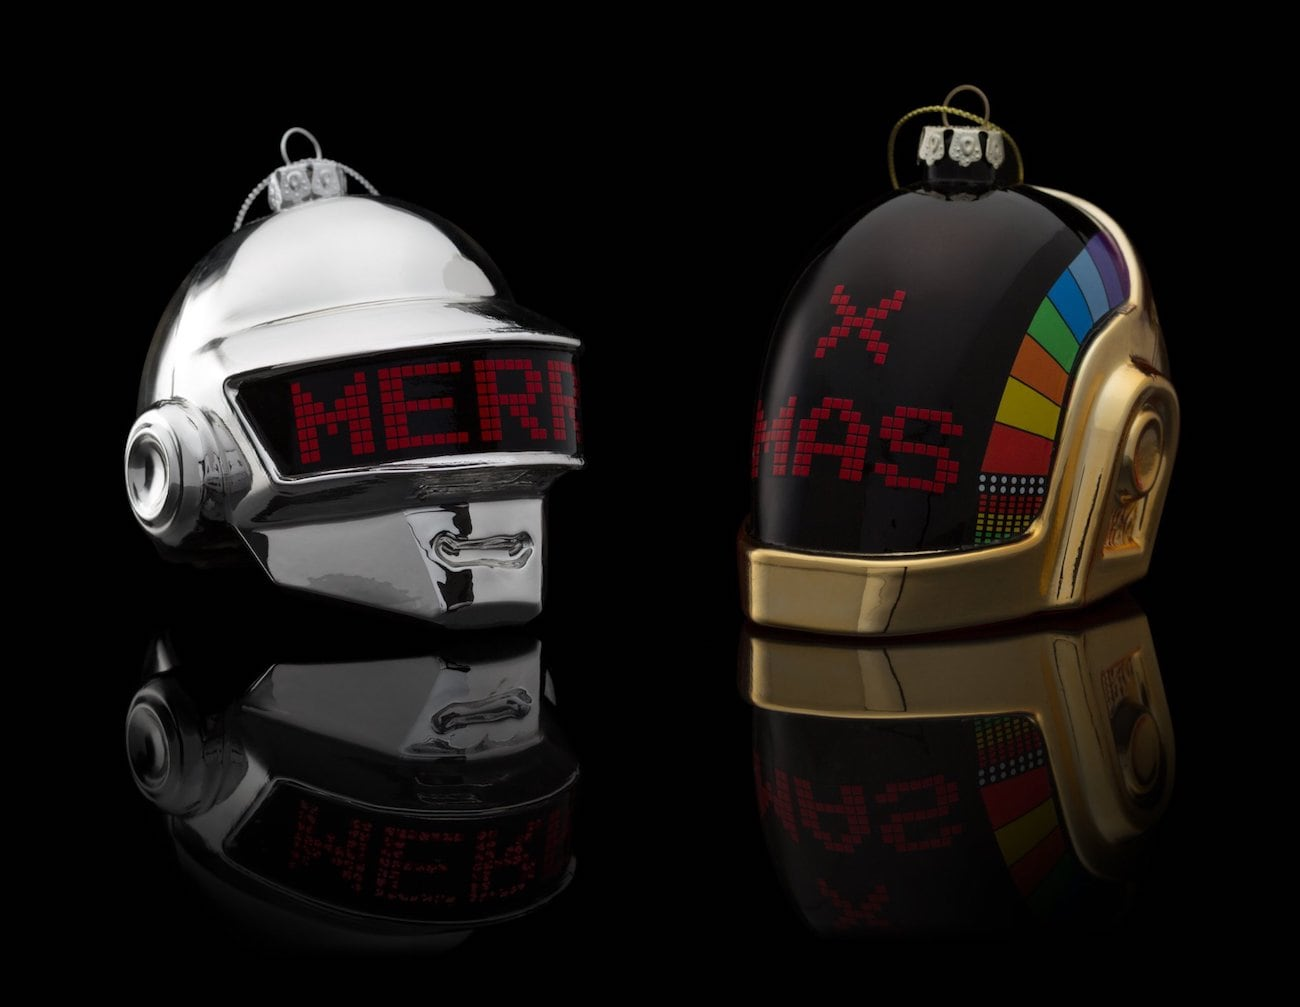 Daft+Punk+Limited+Edition+Ornament+Set